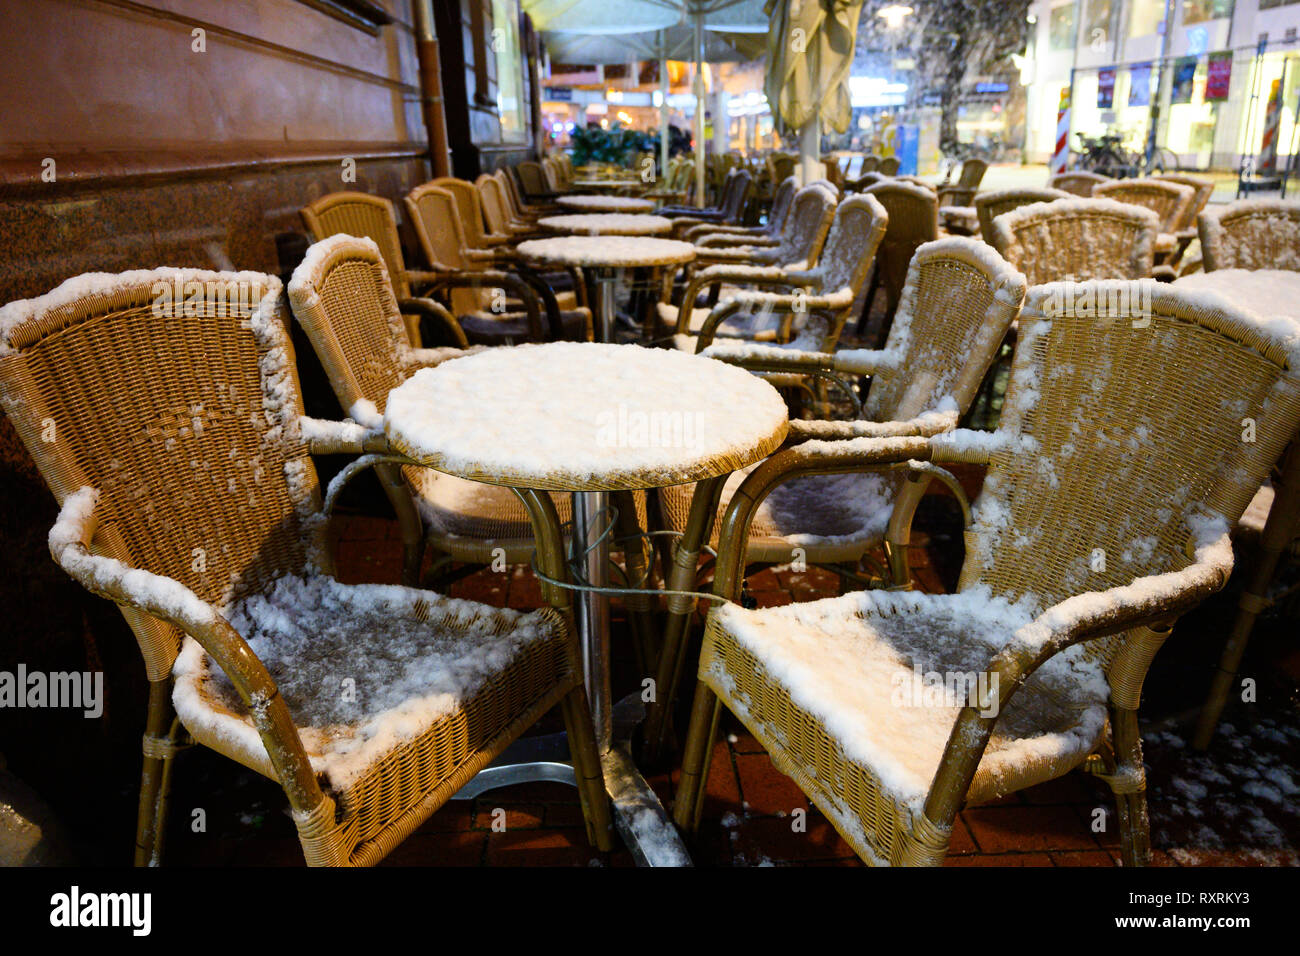 Mar Sedie E Tavoli.Hannover Germania Decimo Mar 2019 Le Sedie E I Tavoli In